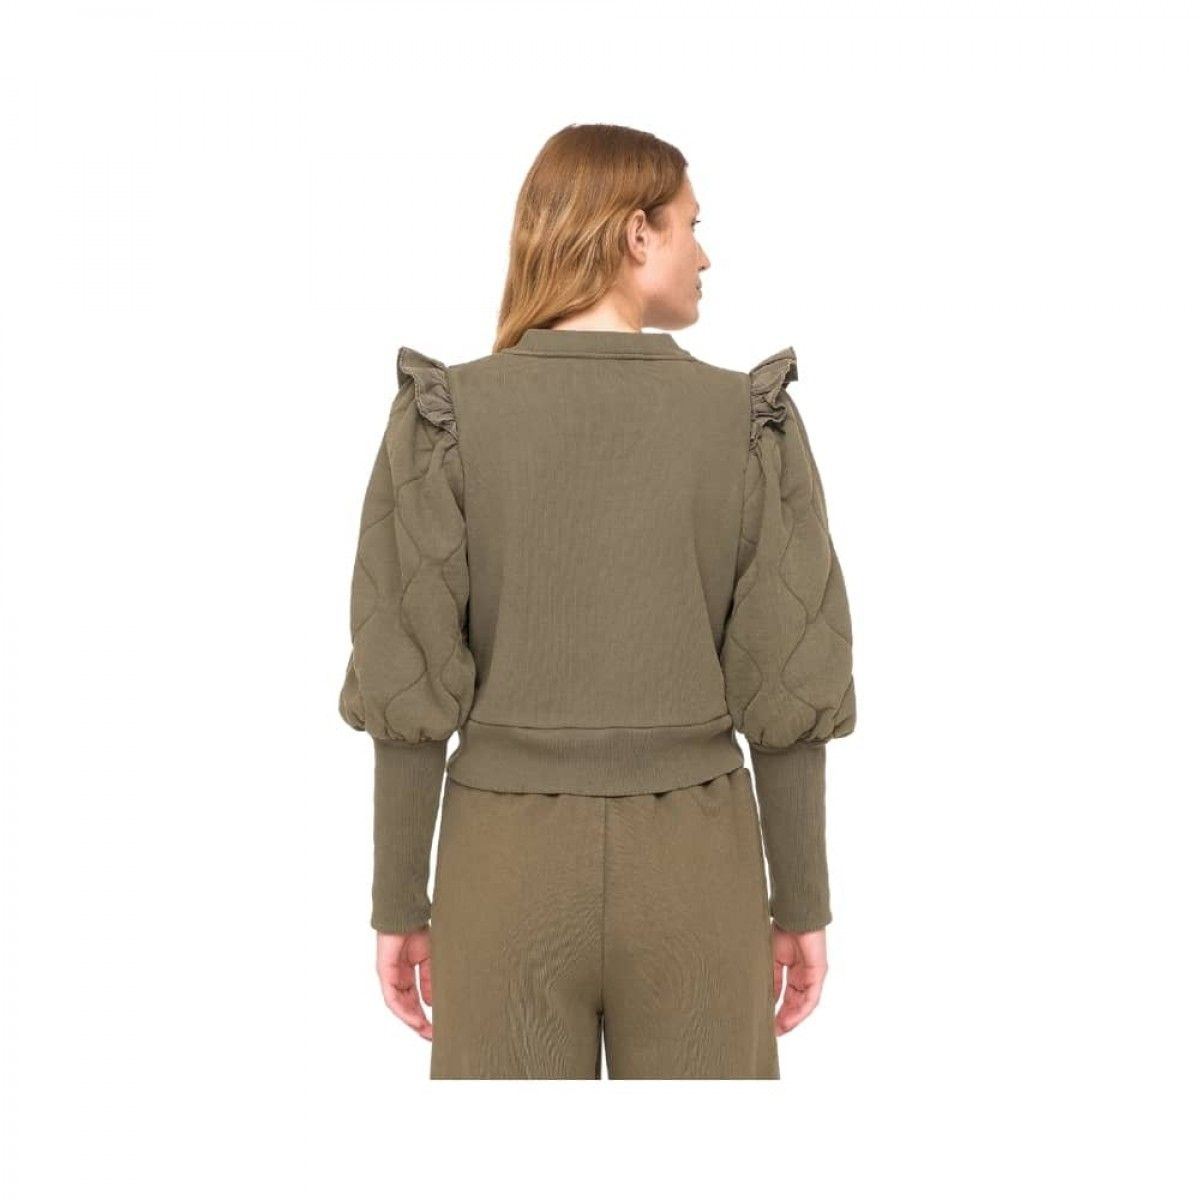 layla sweat - army - model bagfra